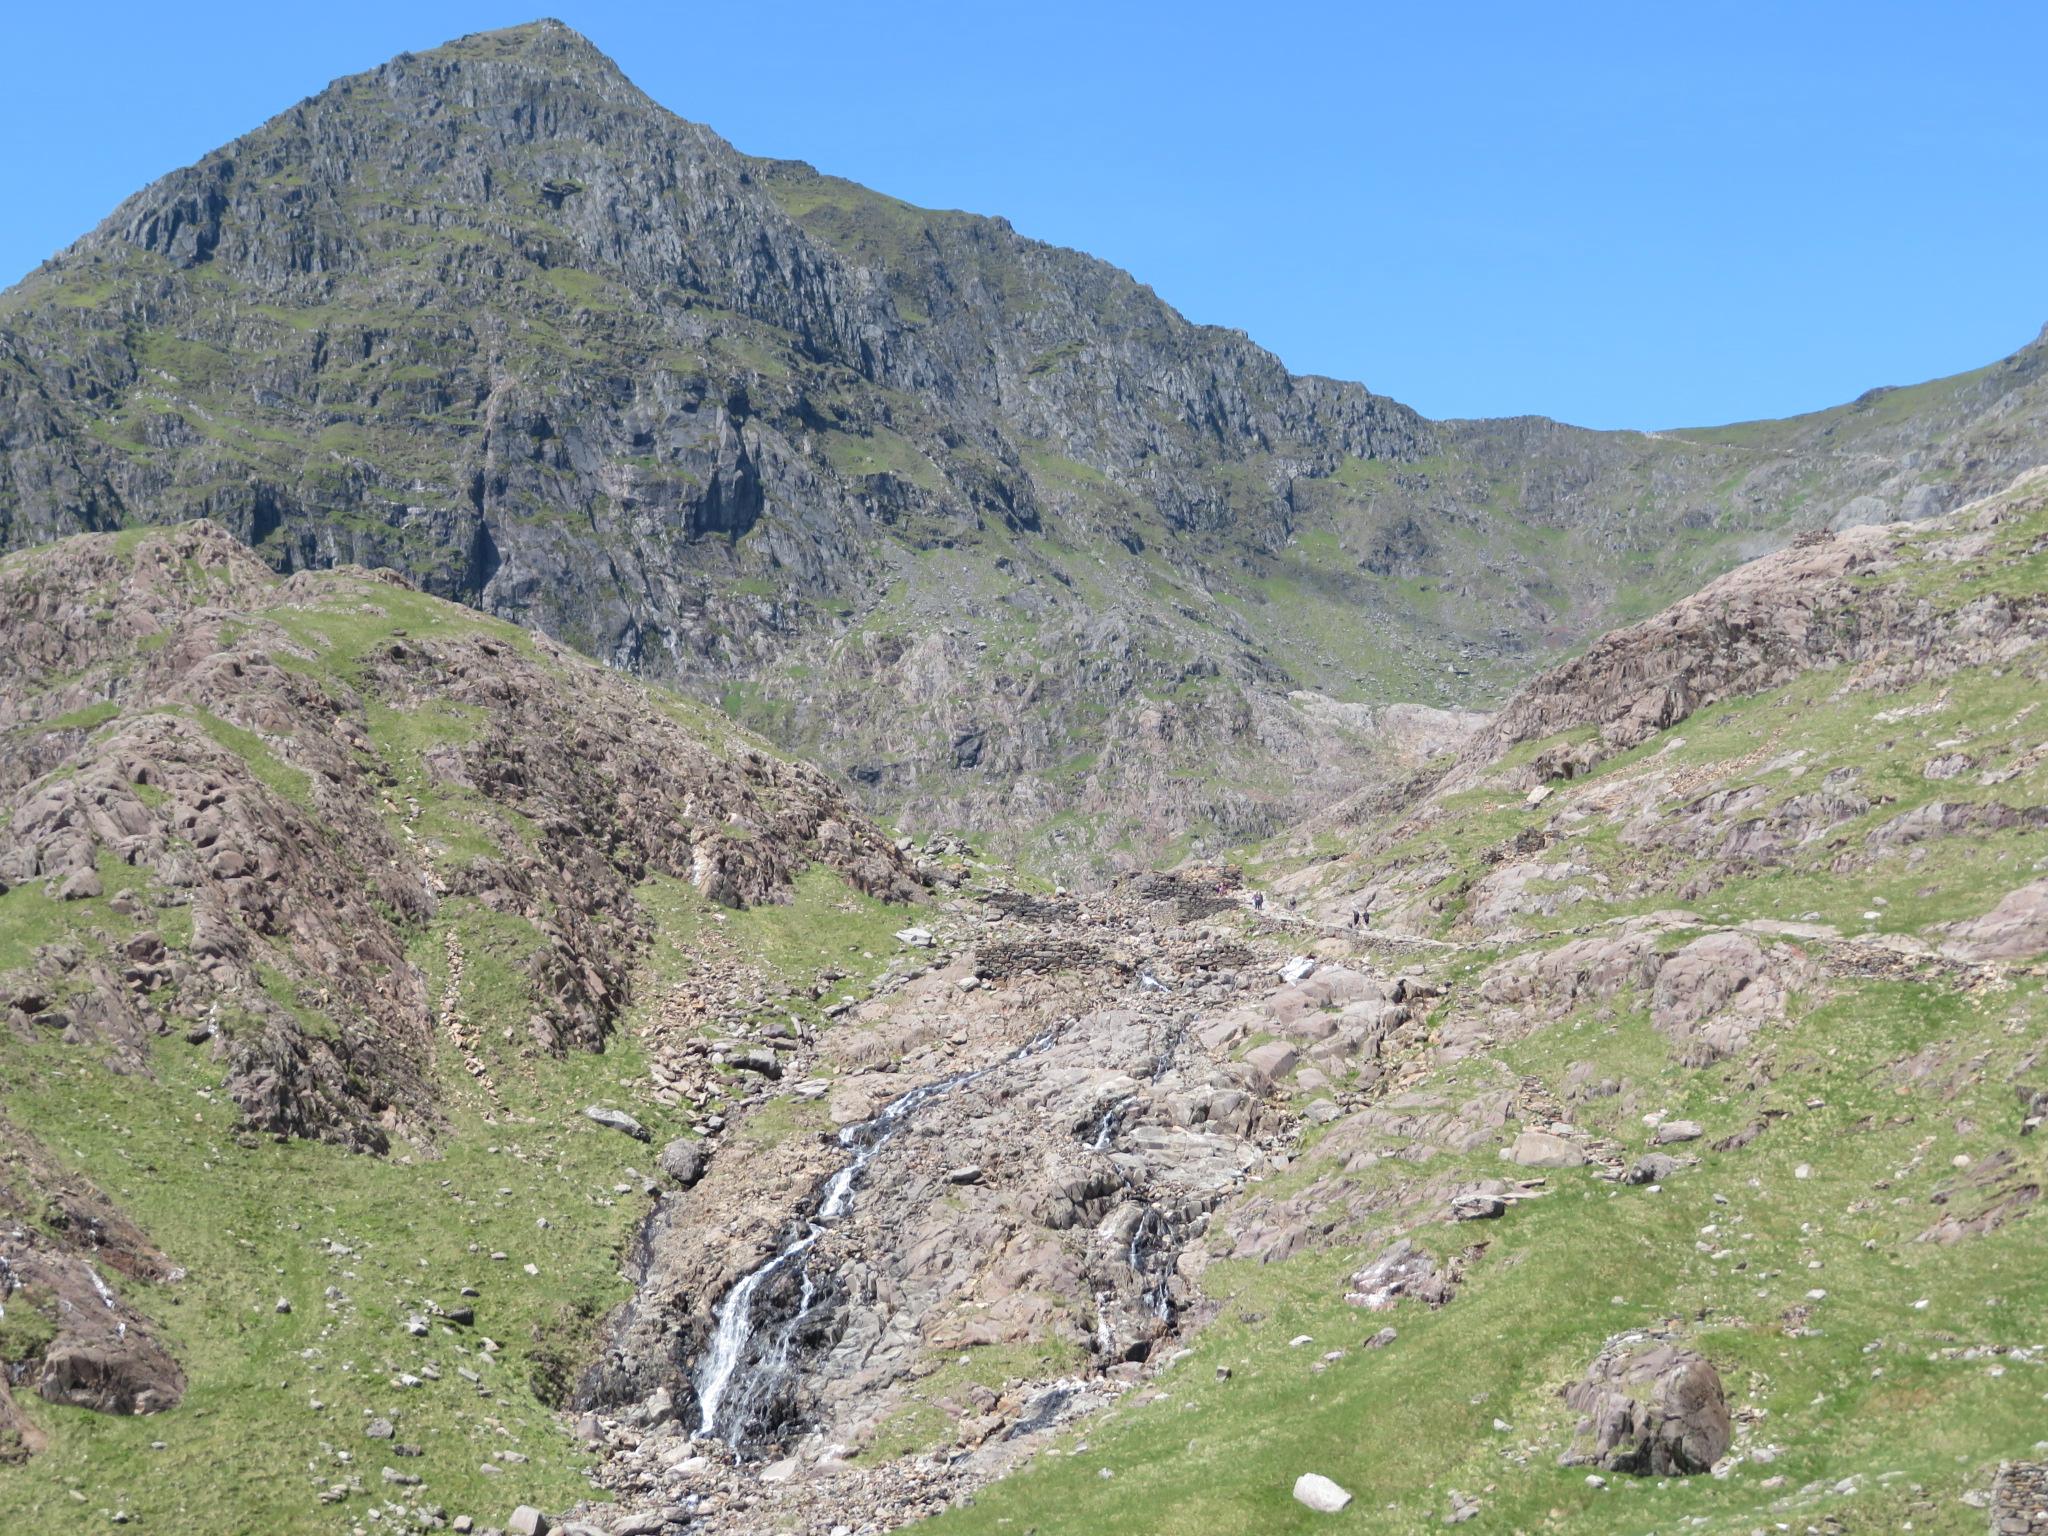 United Kingdom Wales Snowdonia, Snowdon Horseshoe, Snowdon shoulder with Miners and Pyg reaching it, Walkopedia